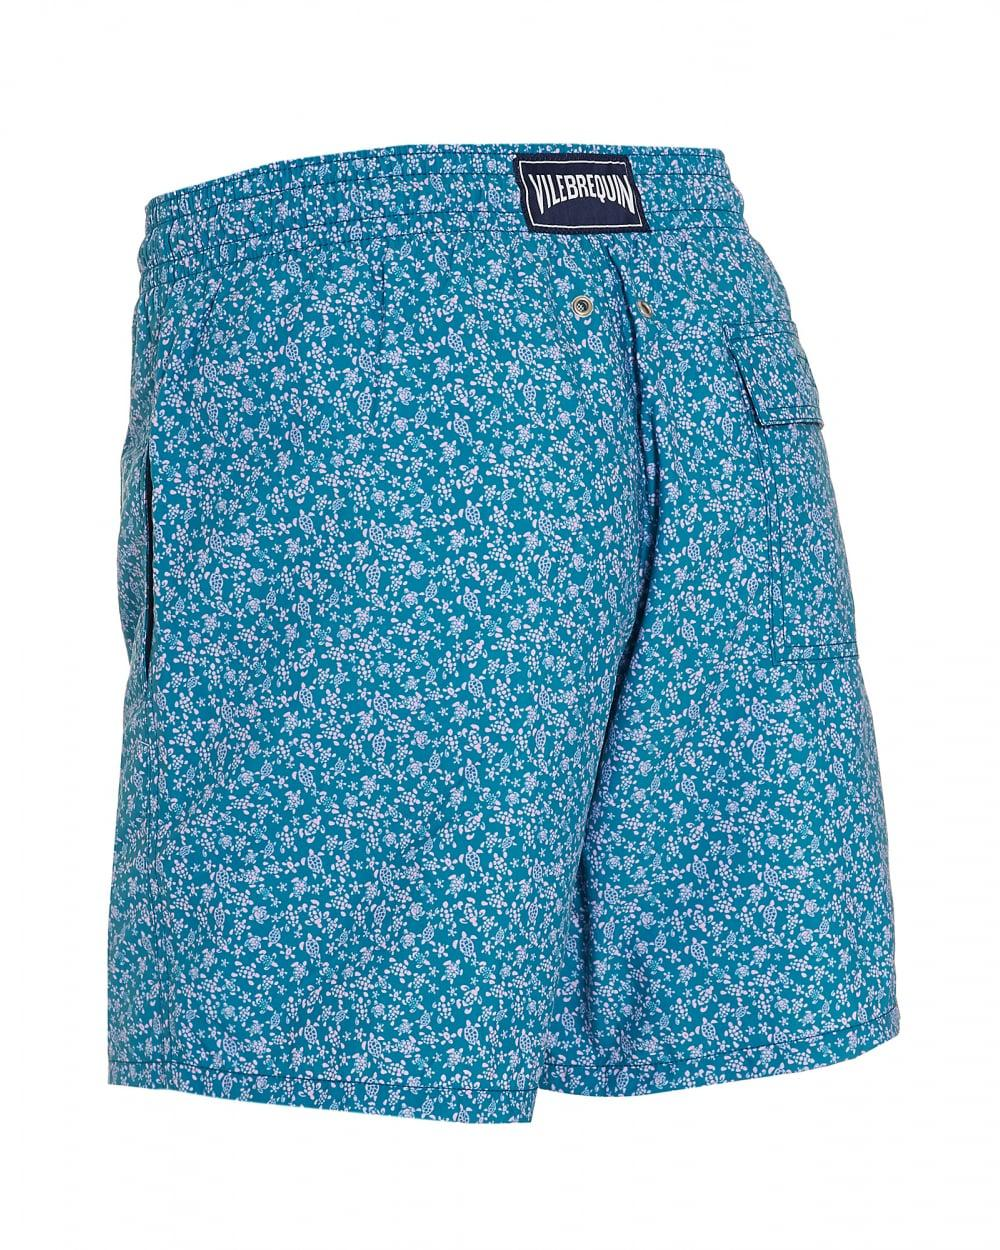 31803ecc27 Vilebrequin Moorea Micro Turtles-print Swim Shorts in Blue for Men - Lyst